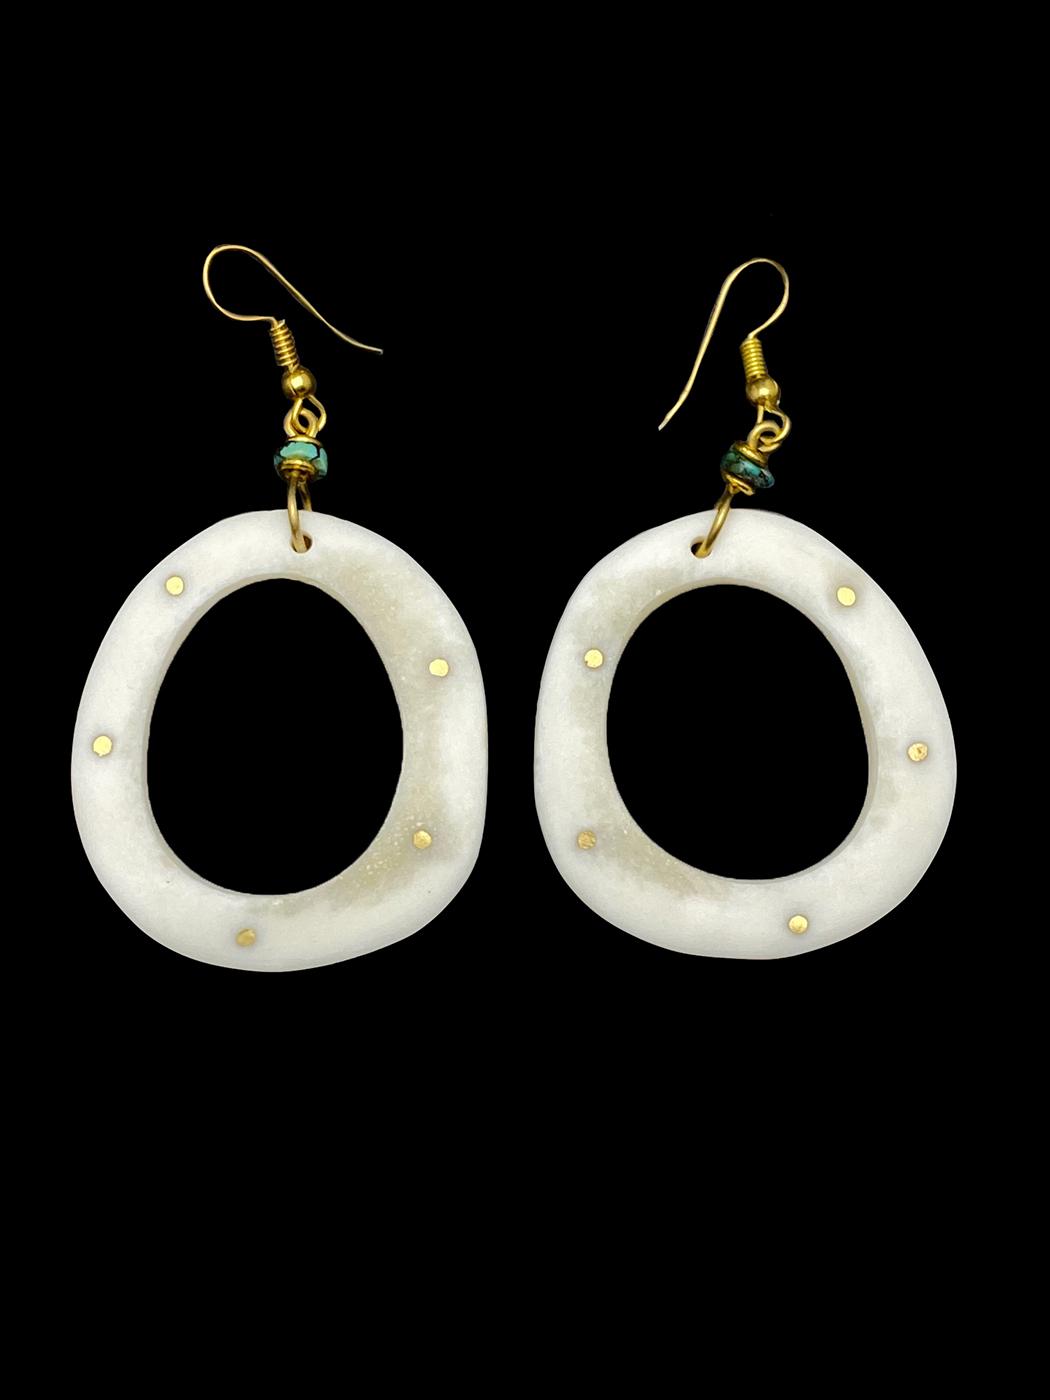 Bone, Brass and Turquoise Earrings - Kenya